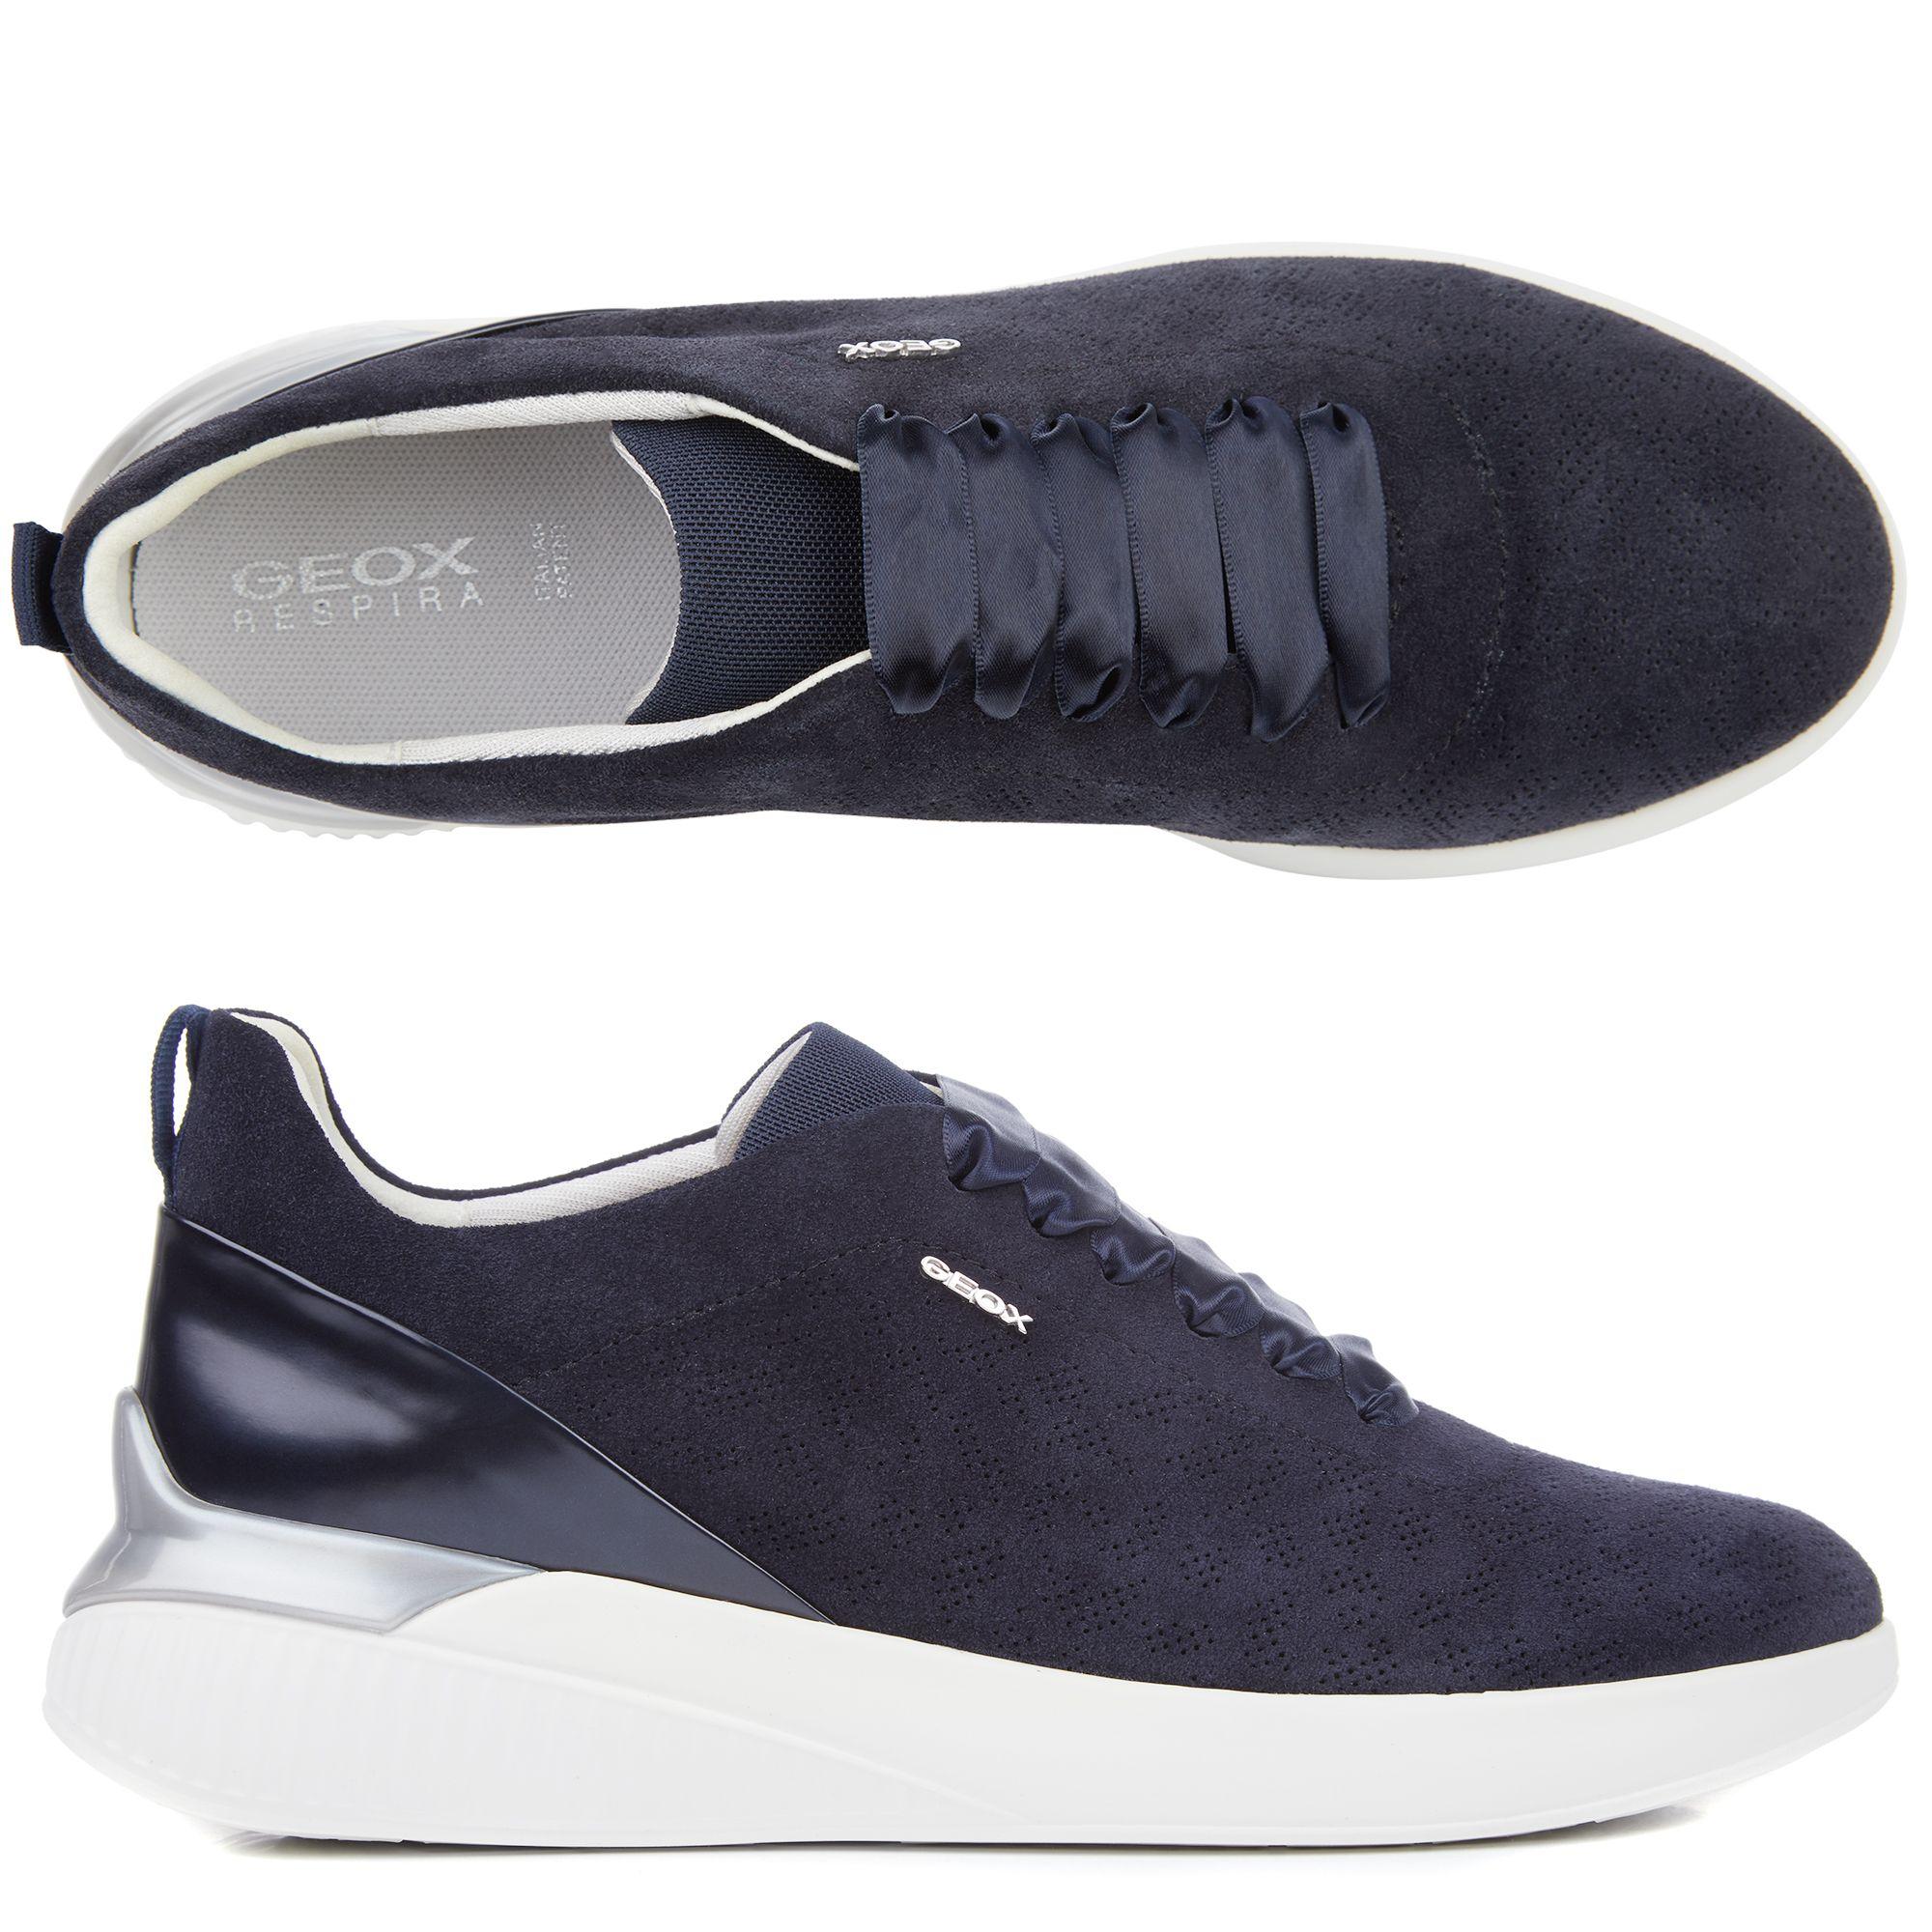 GEOX Damen Sneaker Theragon Materialmix atmungsaktive Sohle —